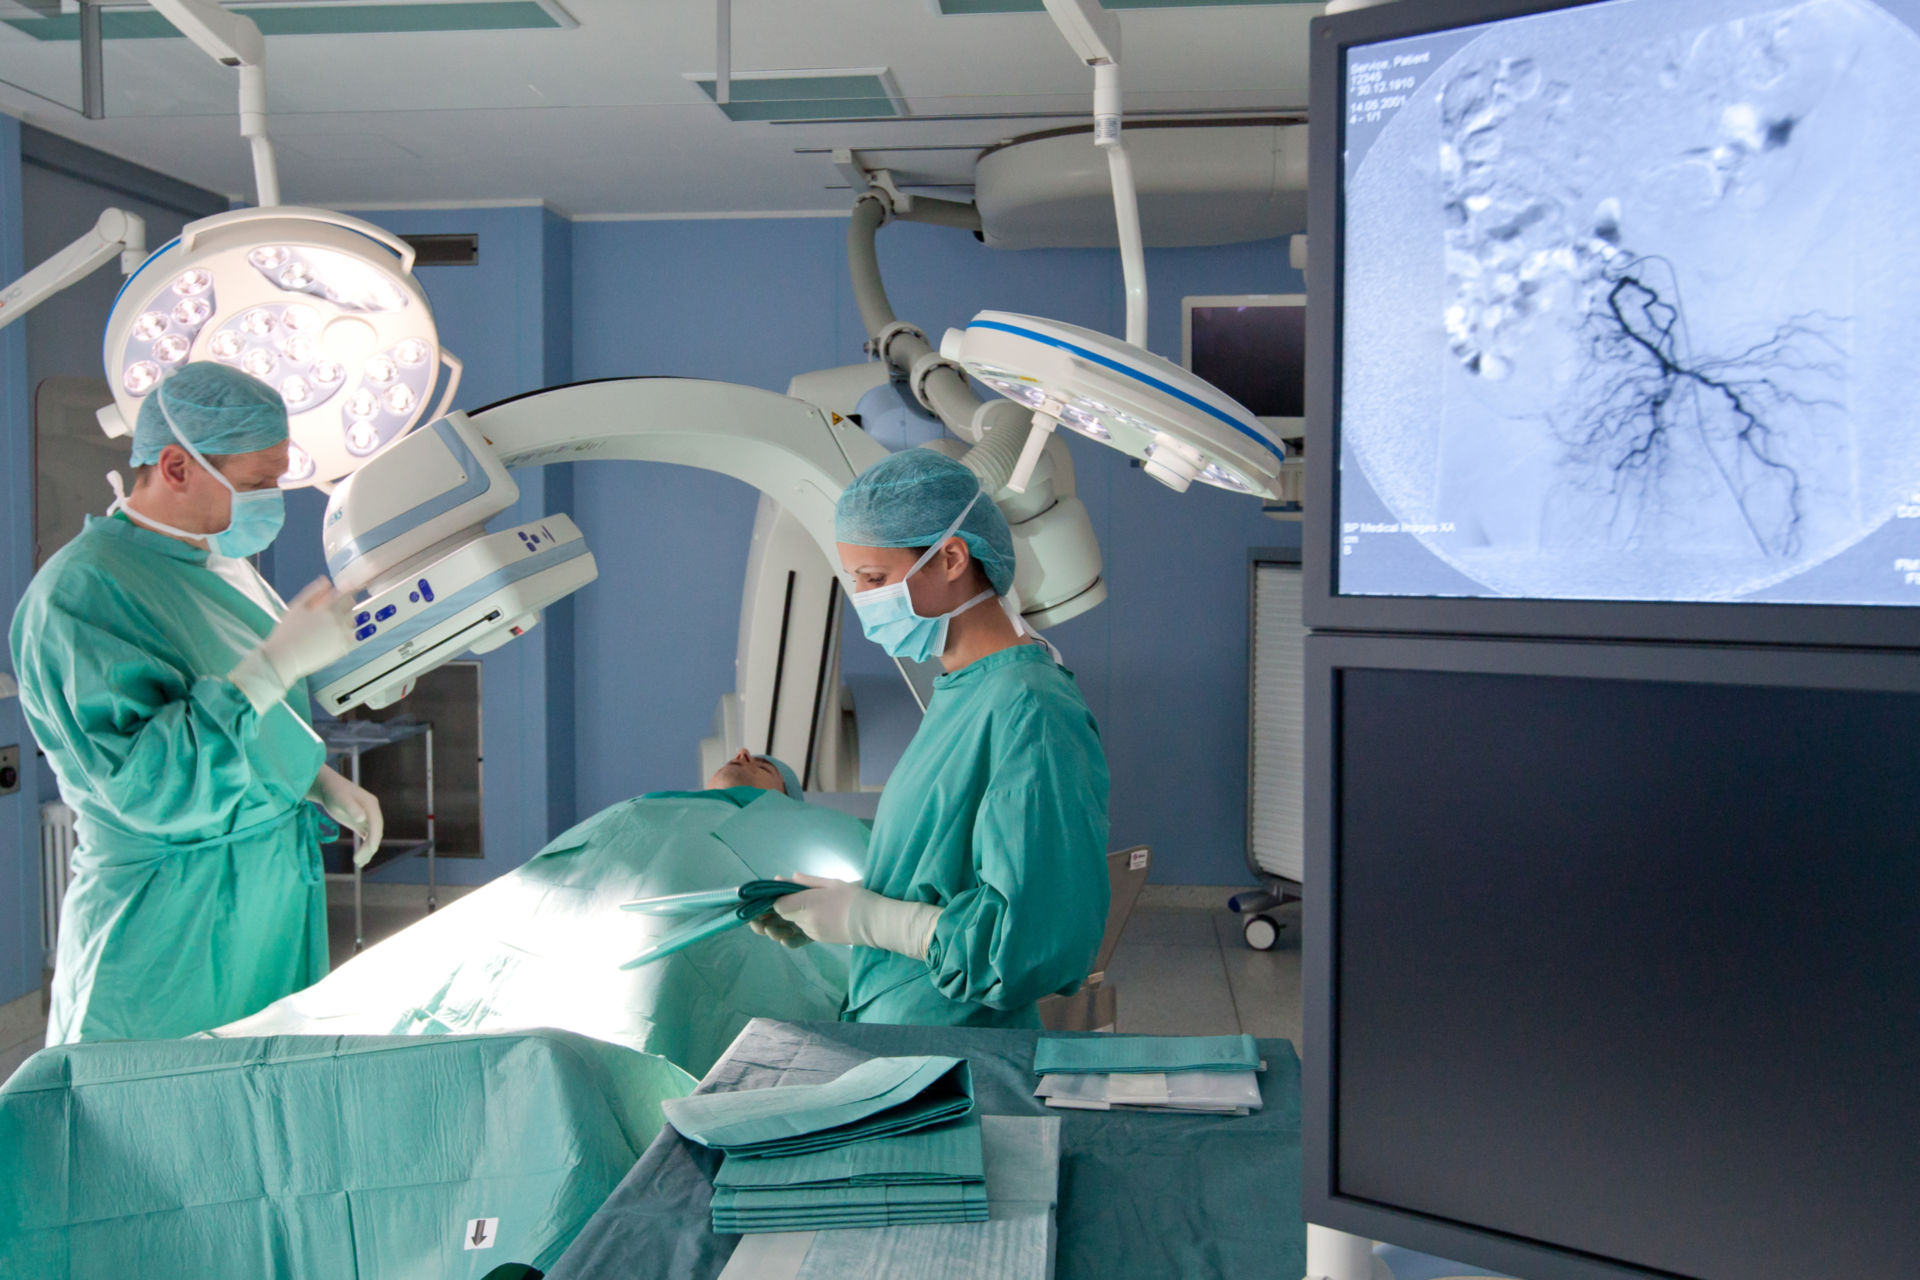 L'angiografia dentro la sala operatoria ibrida